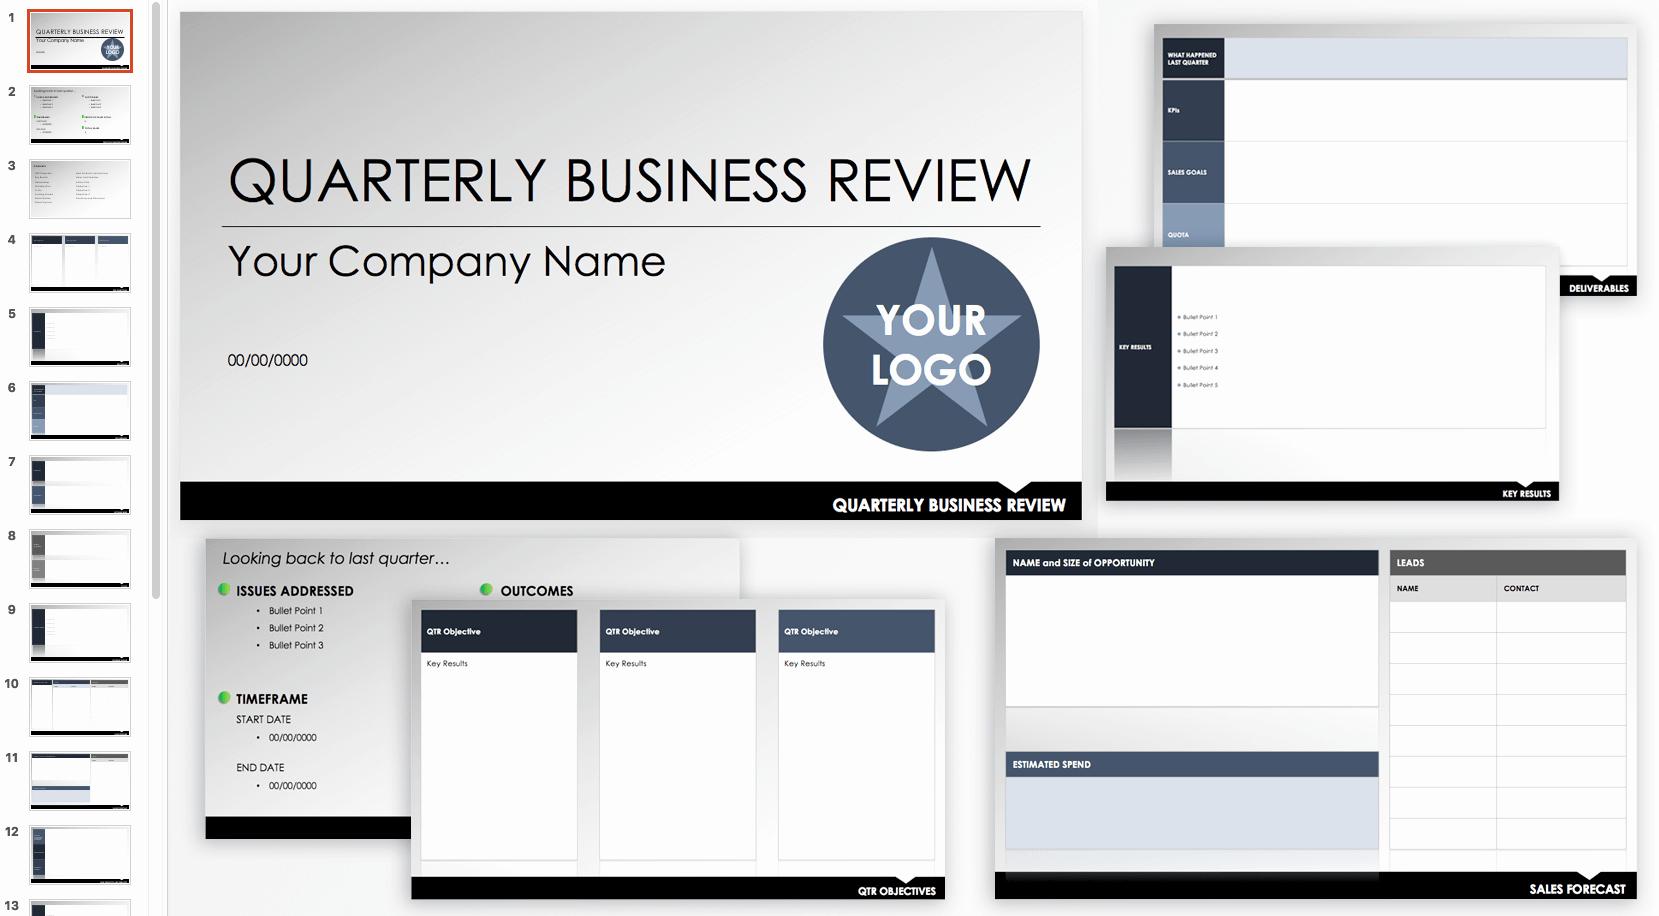 Quarterly Business Review Templates Inspirational Free Qbr and Business Review Templates